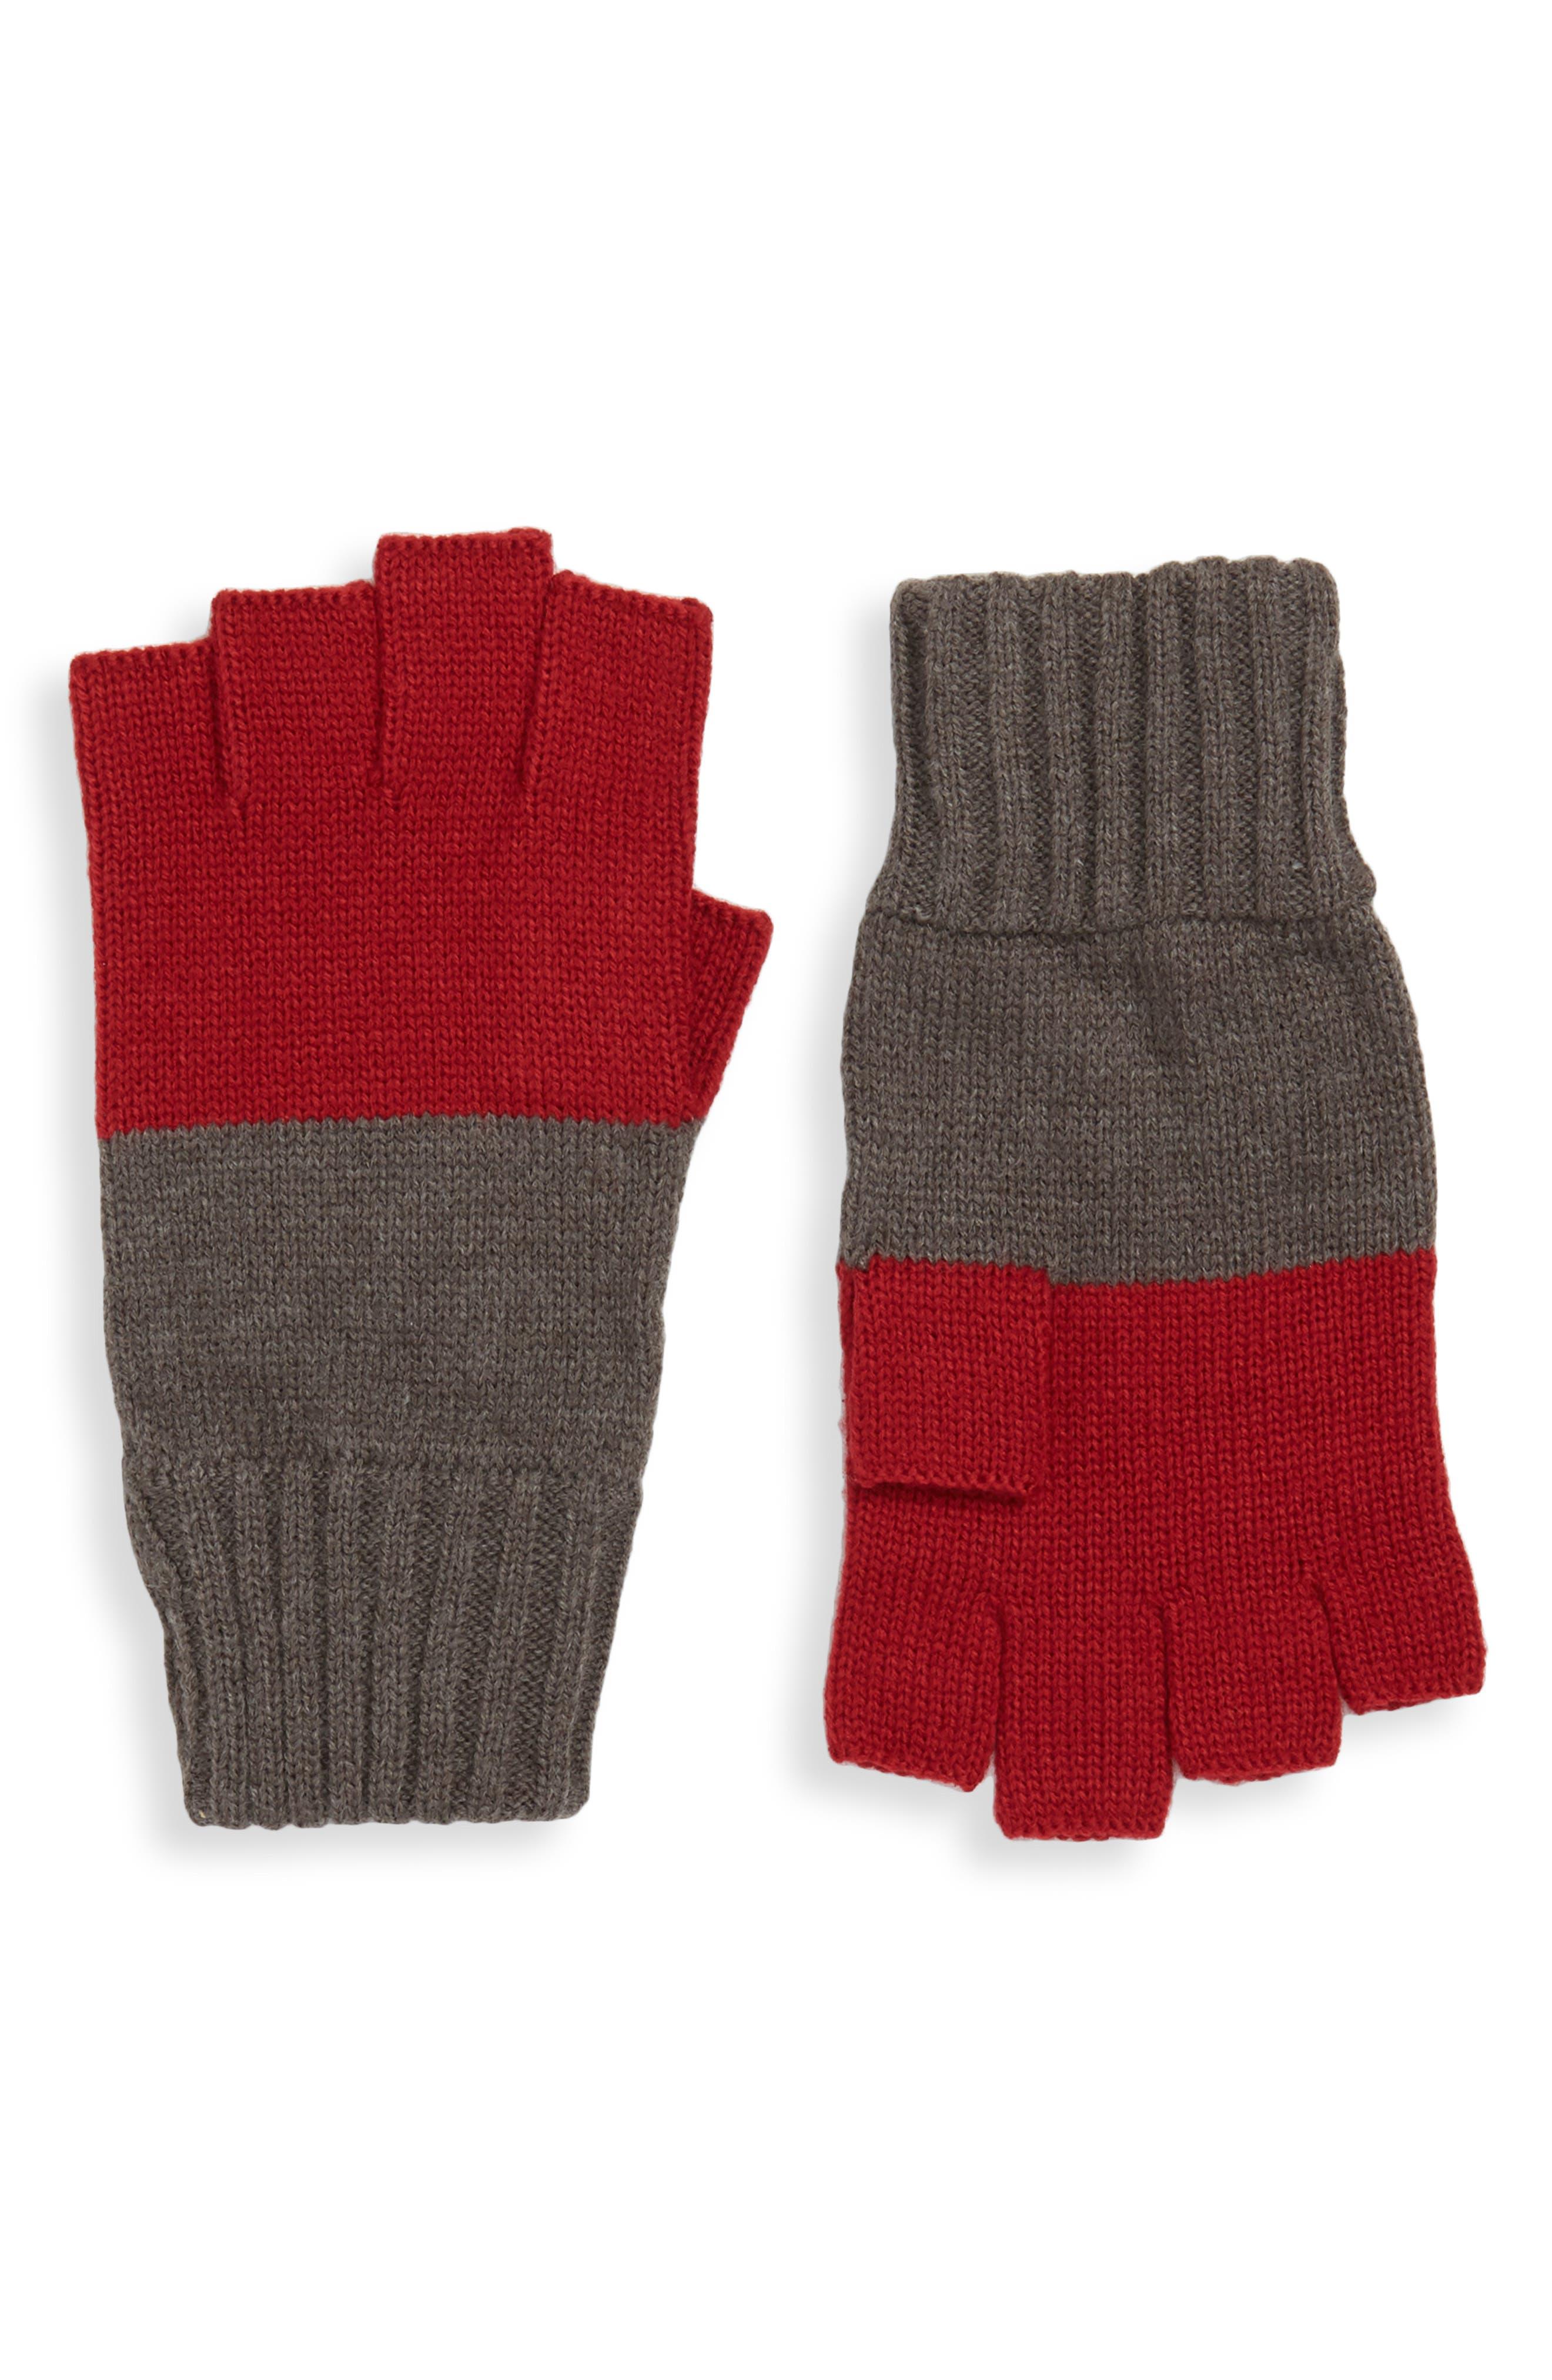 THE RAIL Colorblock Fingerless Gloves, Main, color, 021